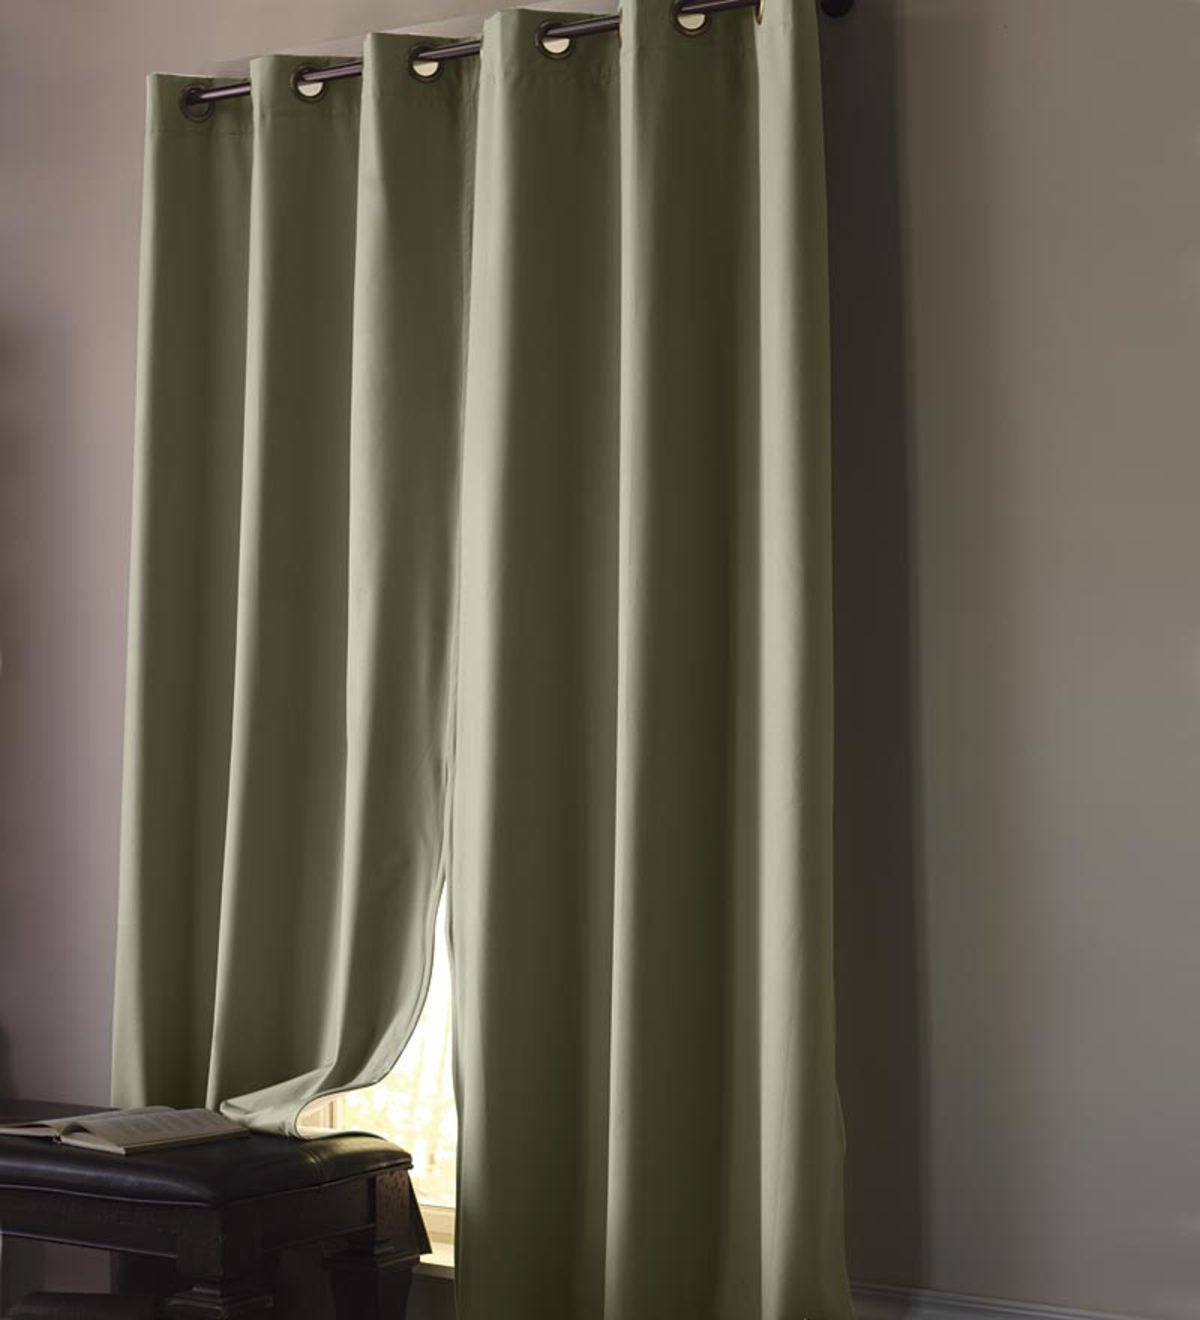 84 L Pair Thermalock Blackout Curtains Plowhearth